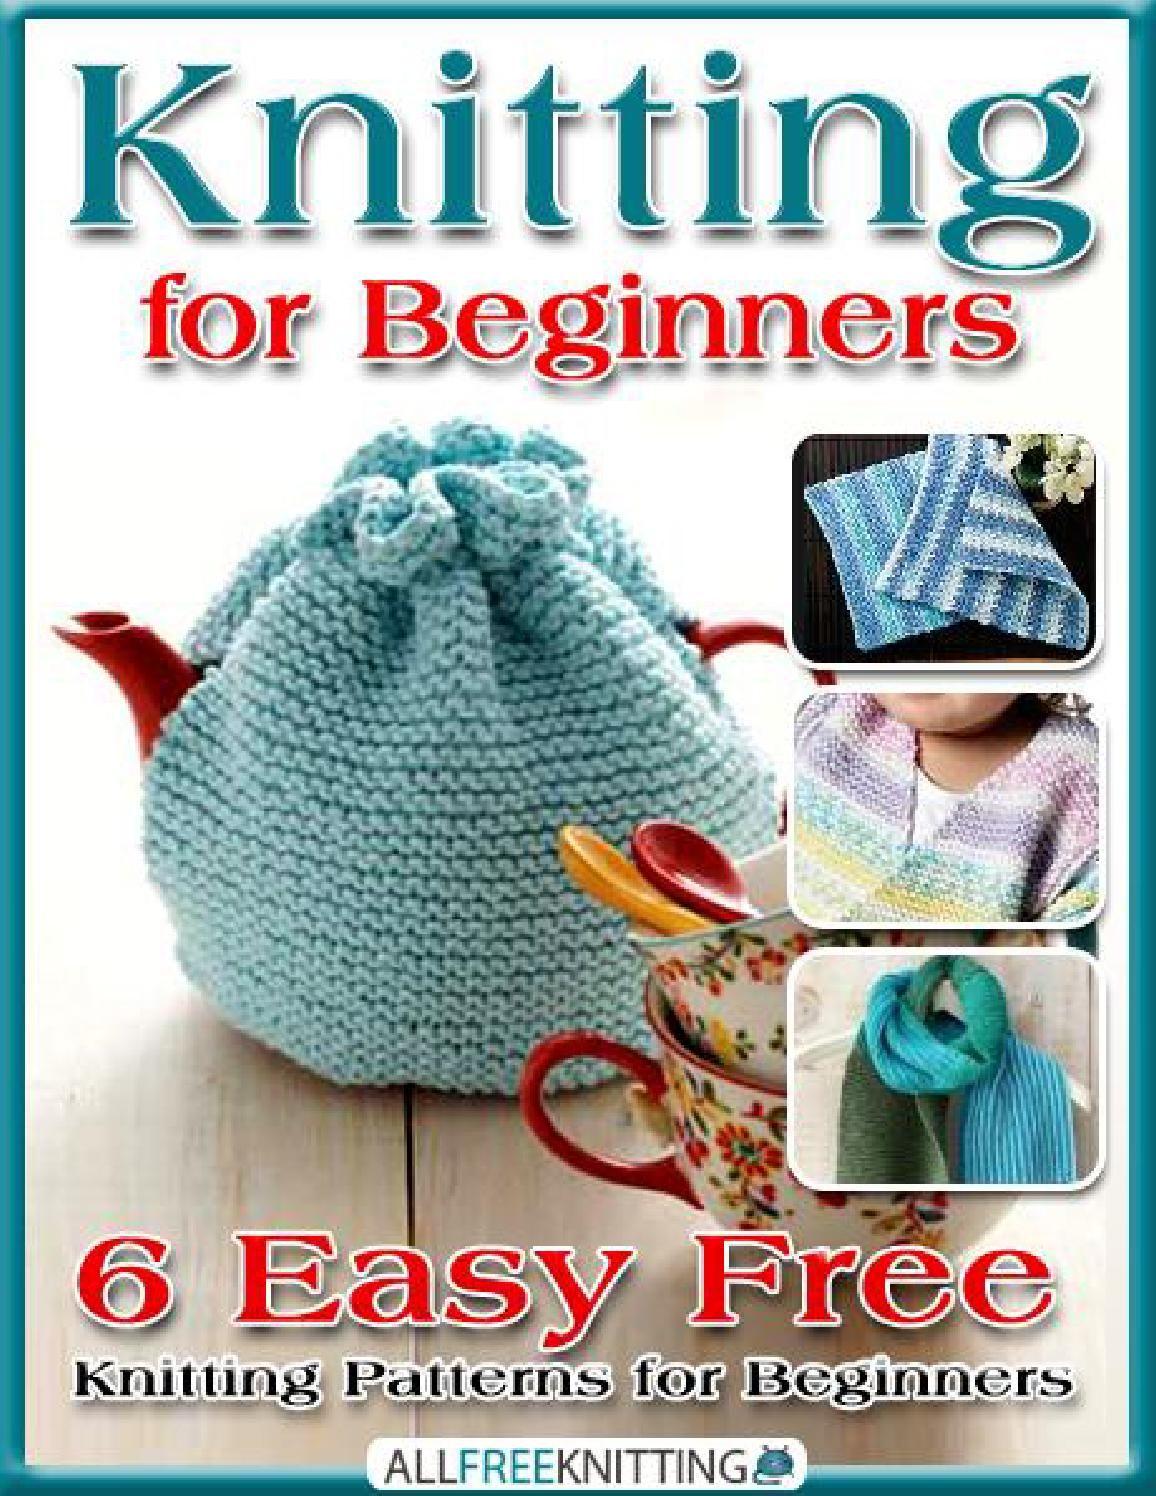 Knitting for beginners 6 easy free knitting patterns for beginners knitting for beginners 6 easy free knitting patterns for beginners bankloansurffo Images